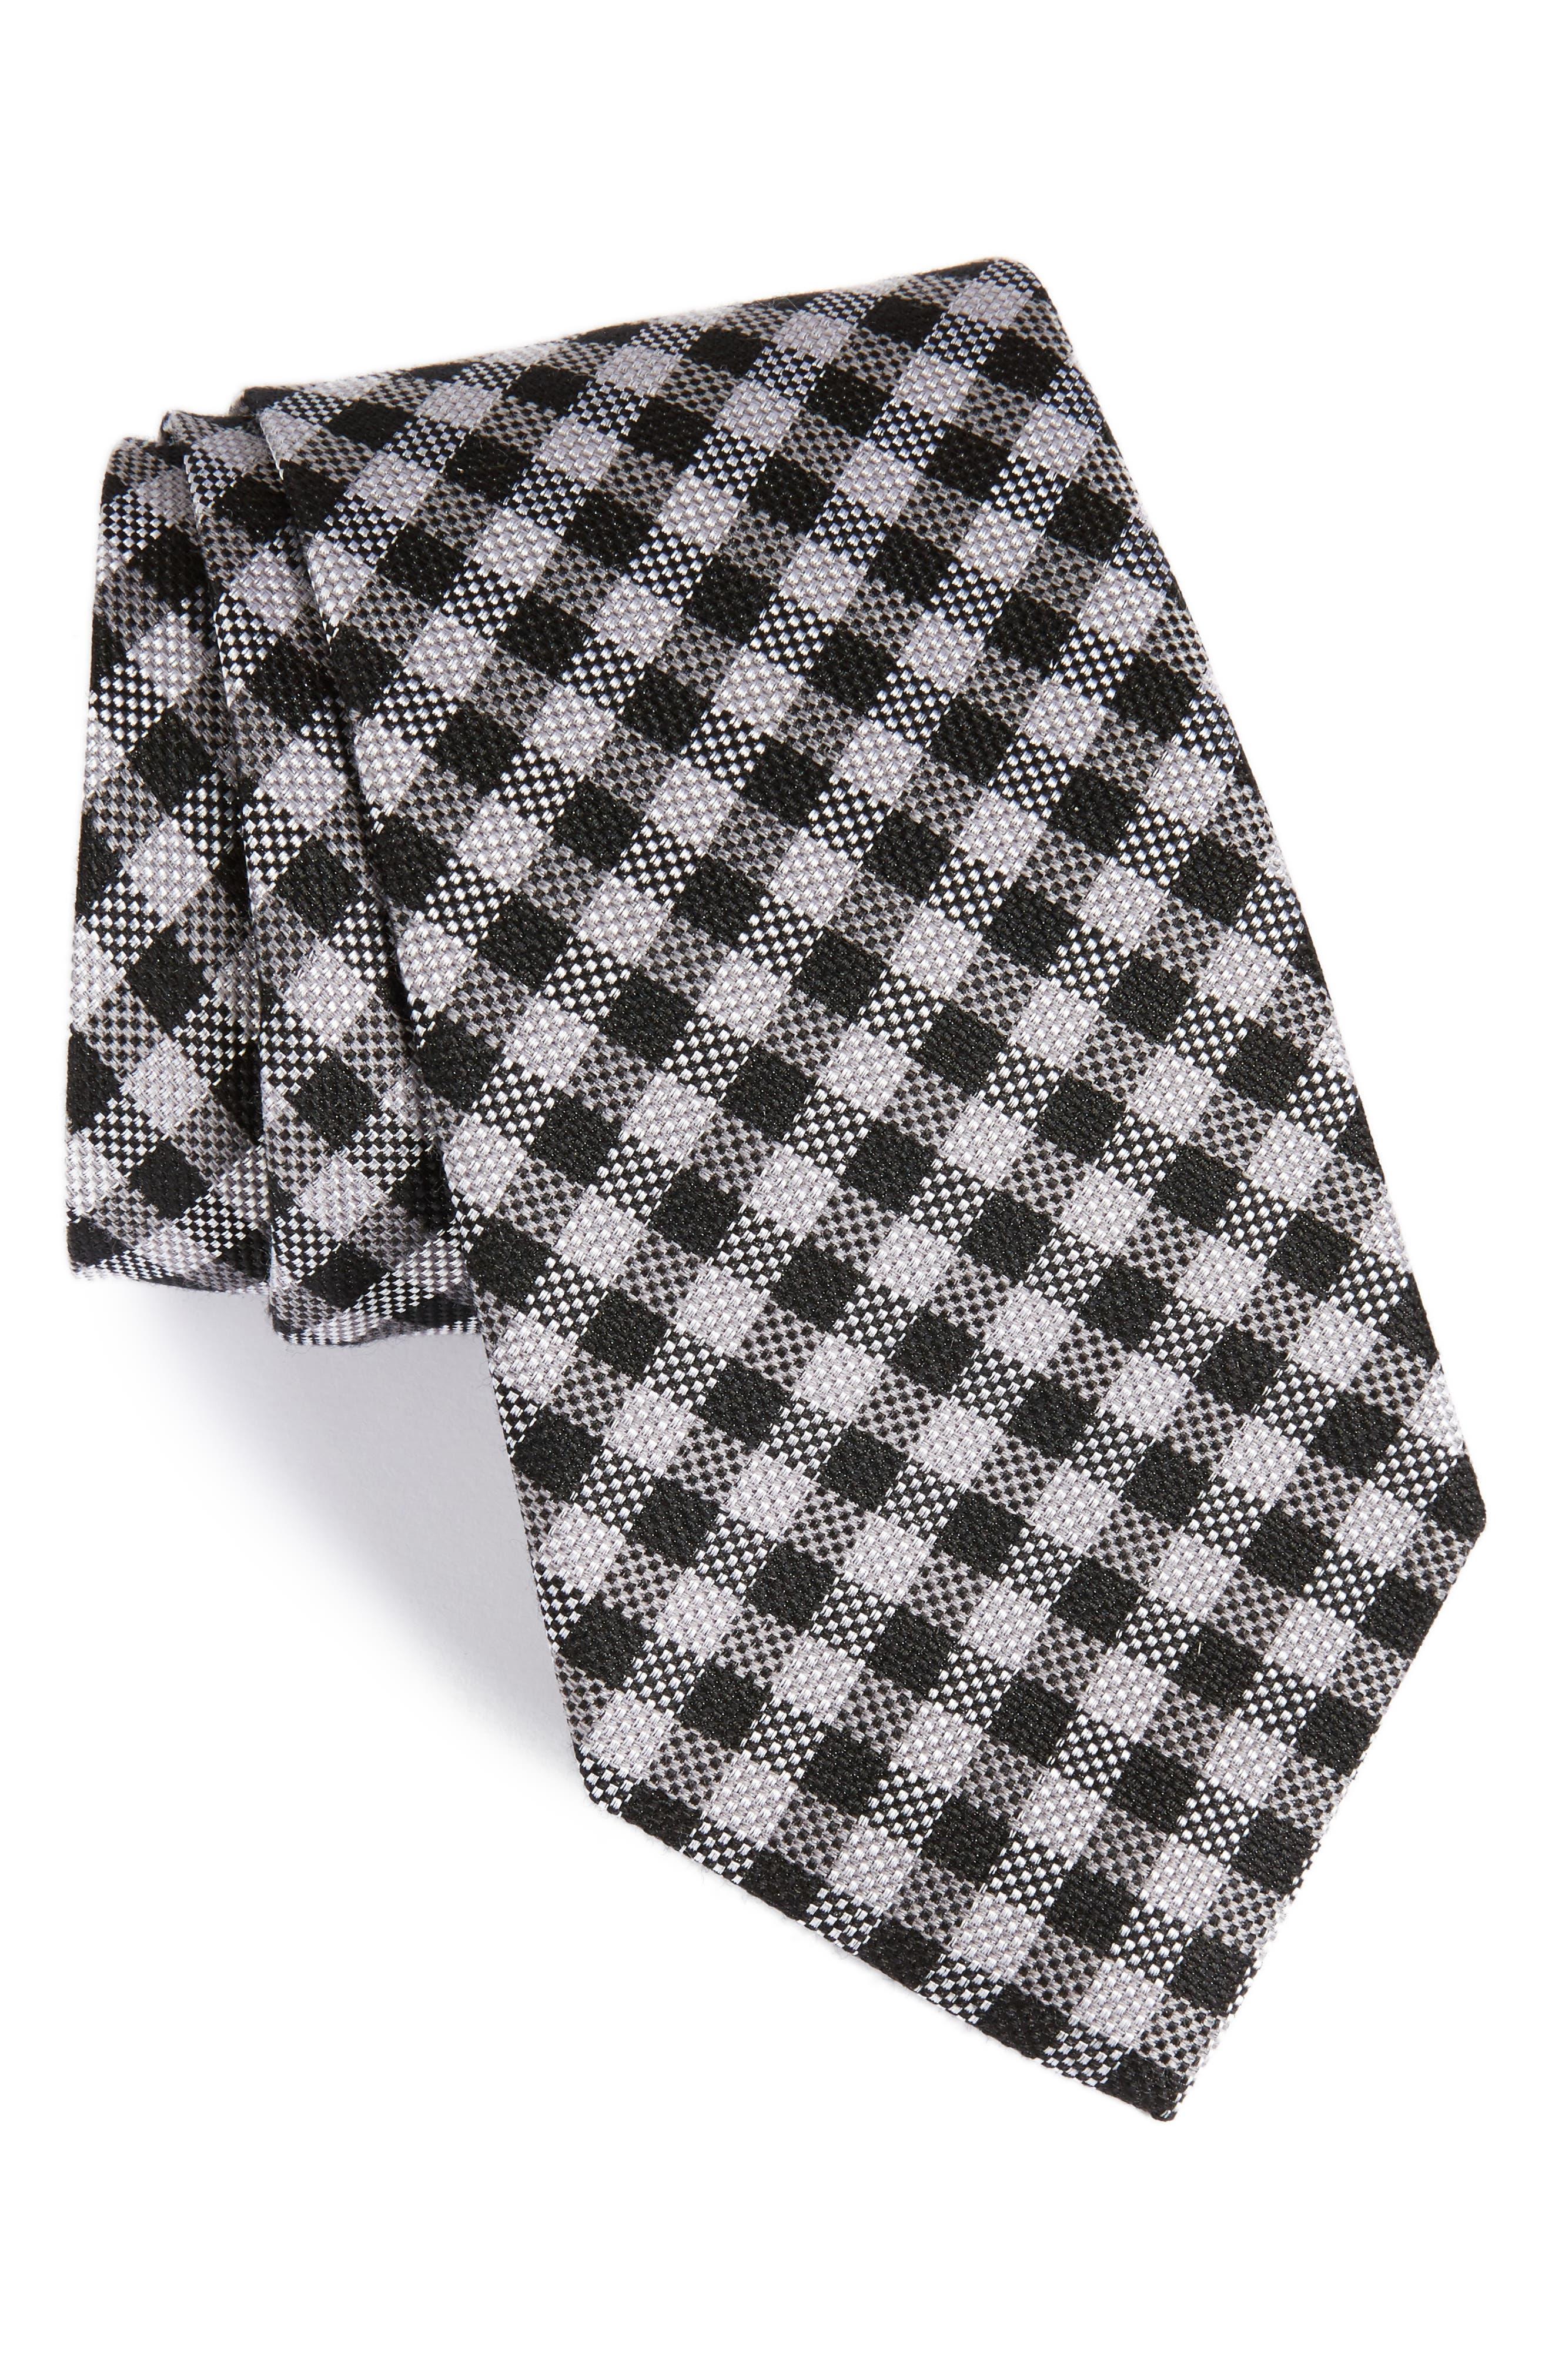 Alternate Image 1 Selected - Nordstrom Men's Shop Check Silk & Wool Tie (X-Long)